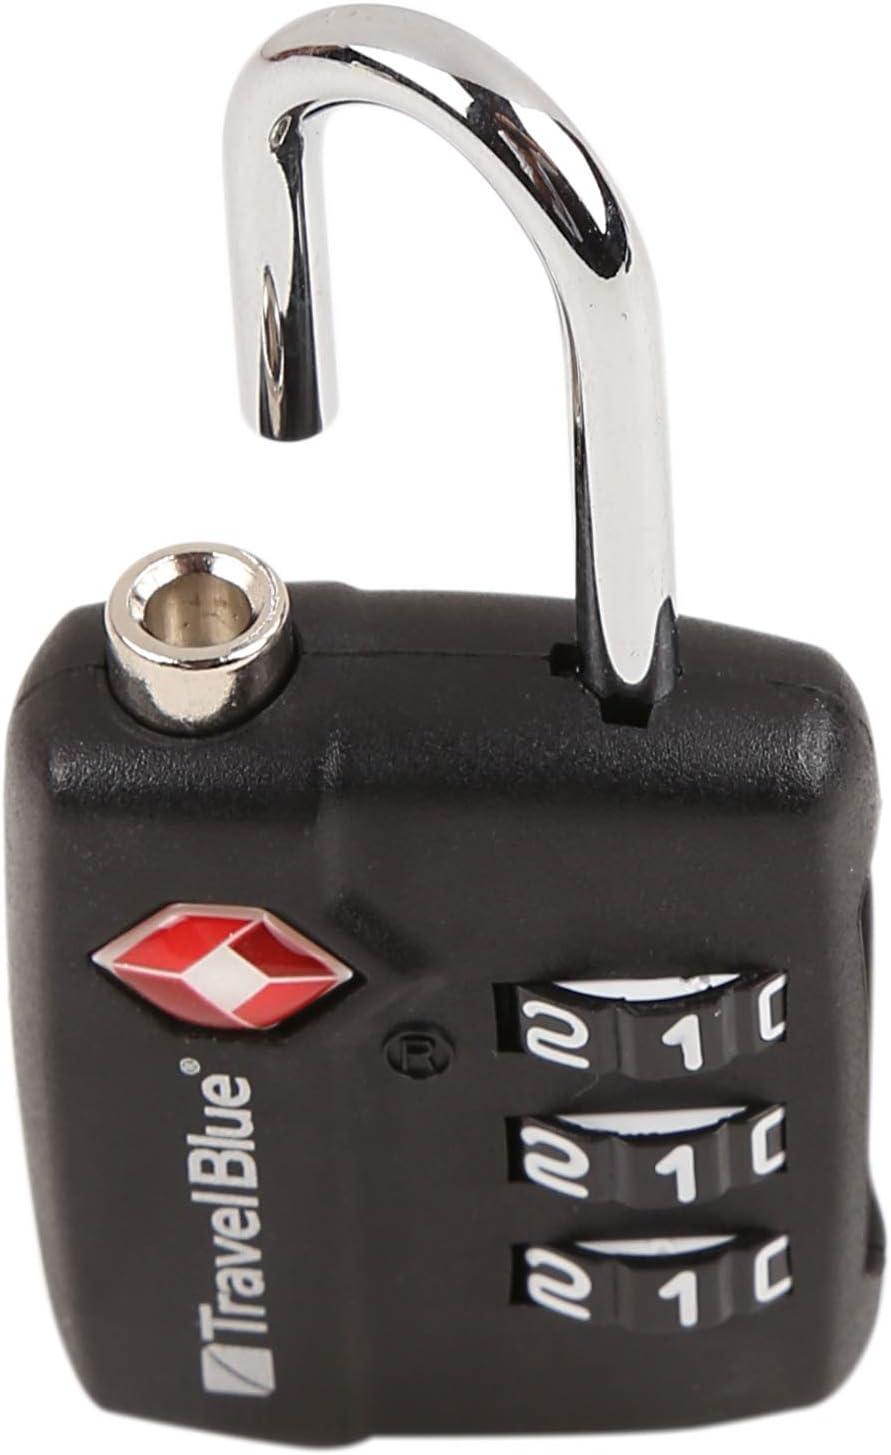 Travel Blue  TSA Combination Luggage Lock One Size Travel Blue LTD 036 Black